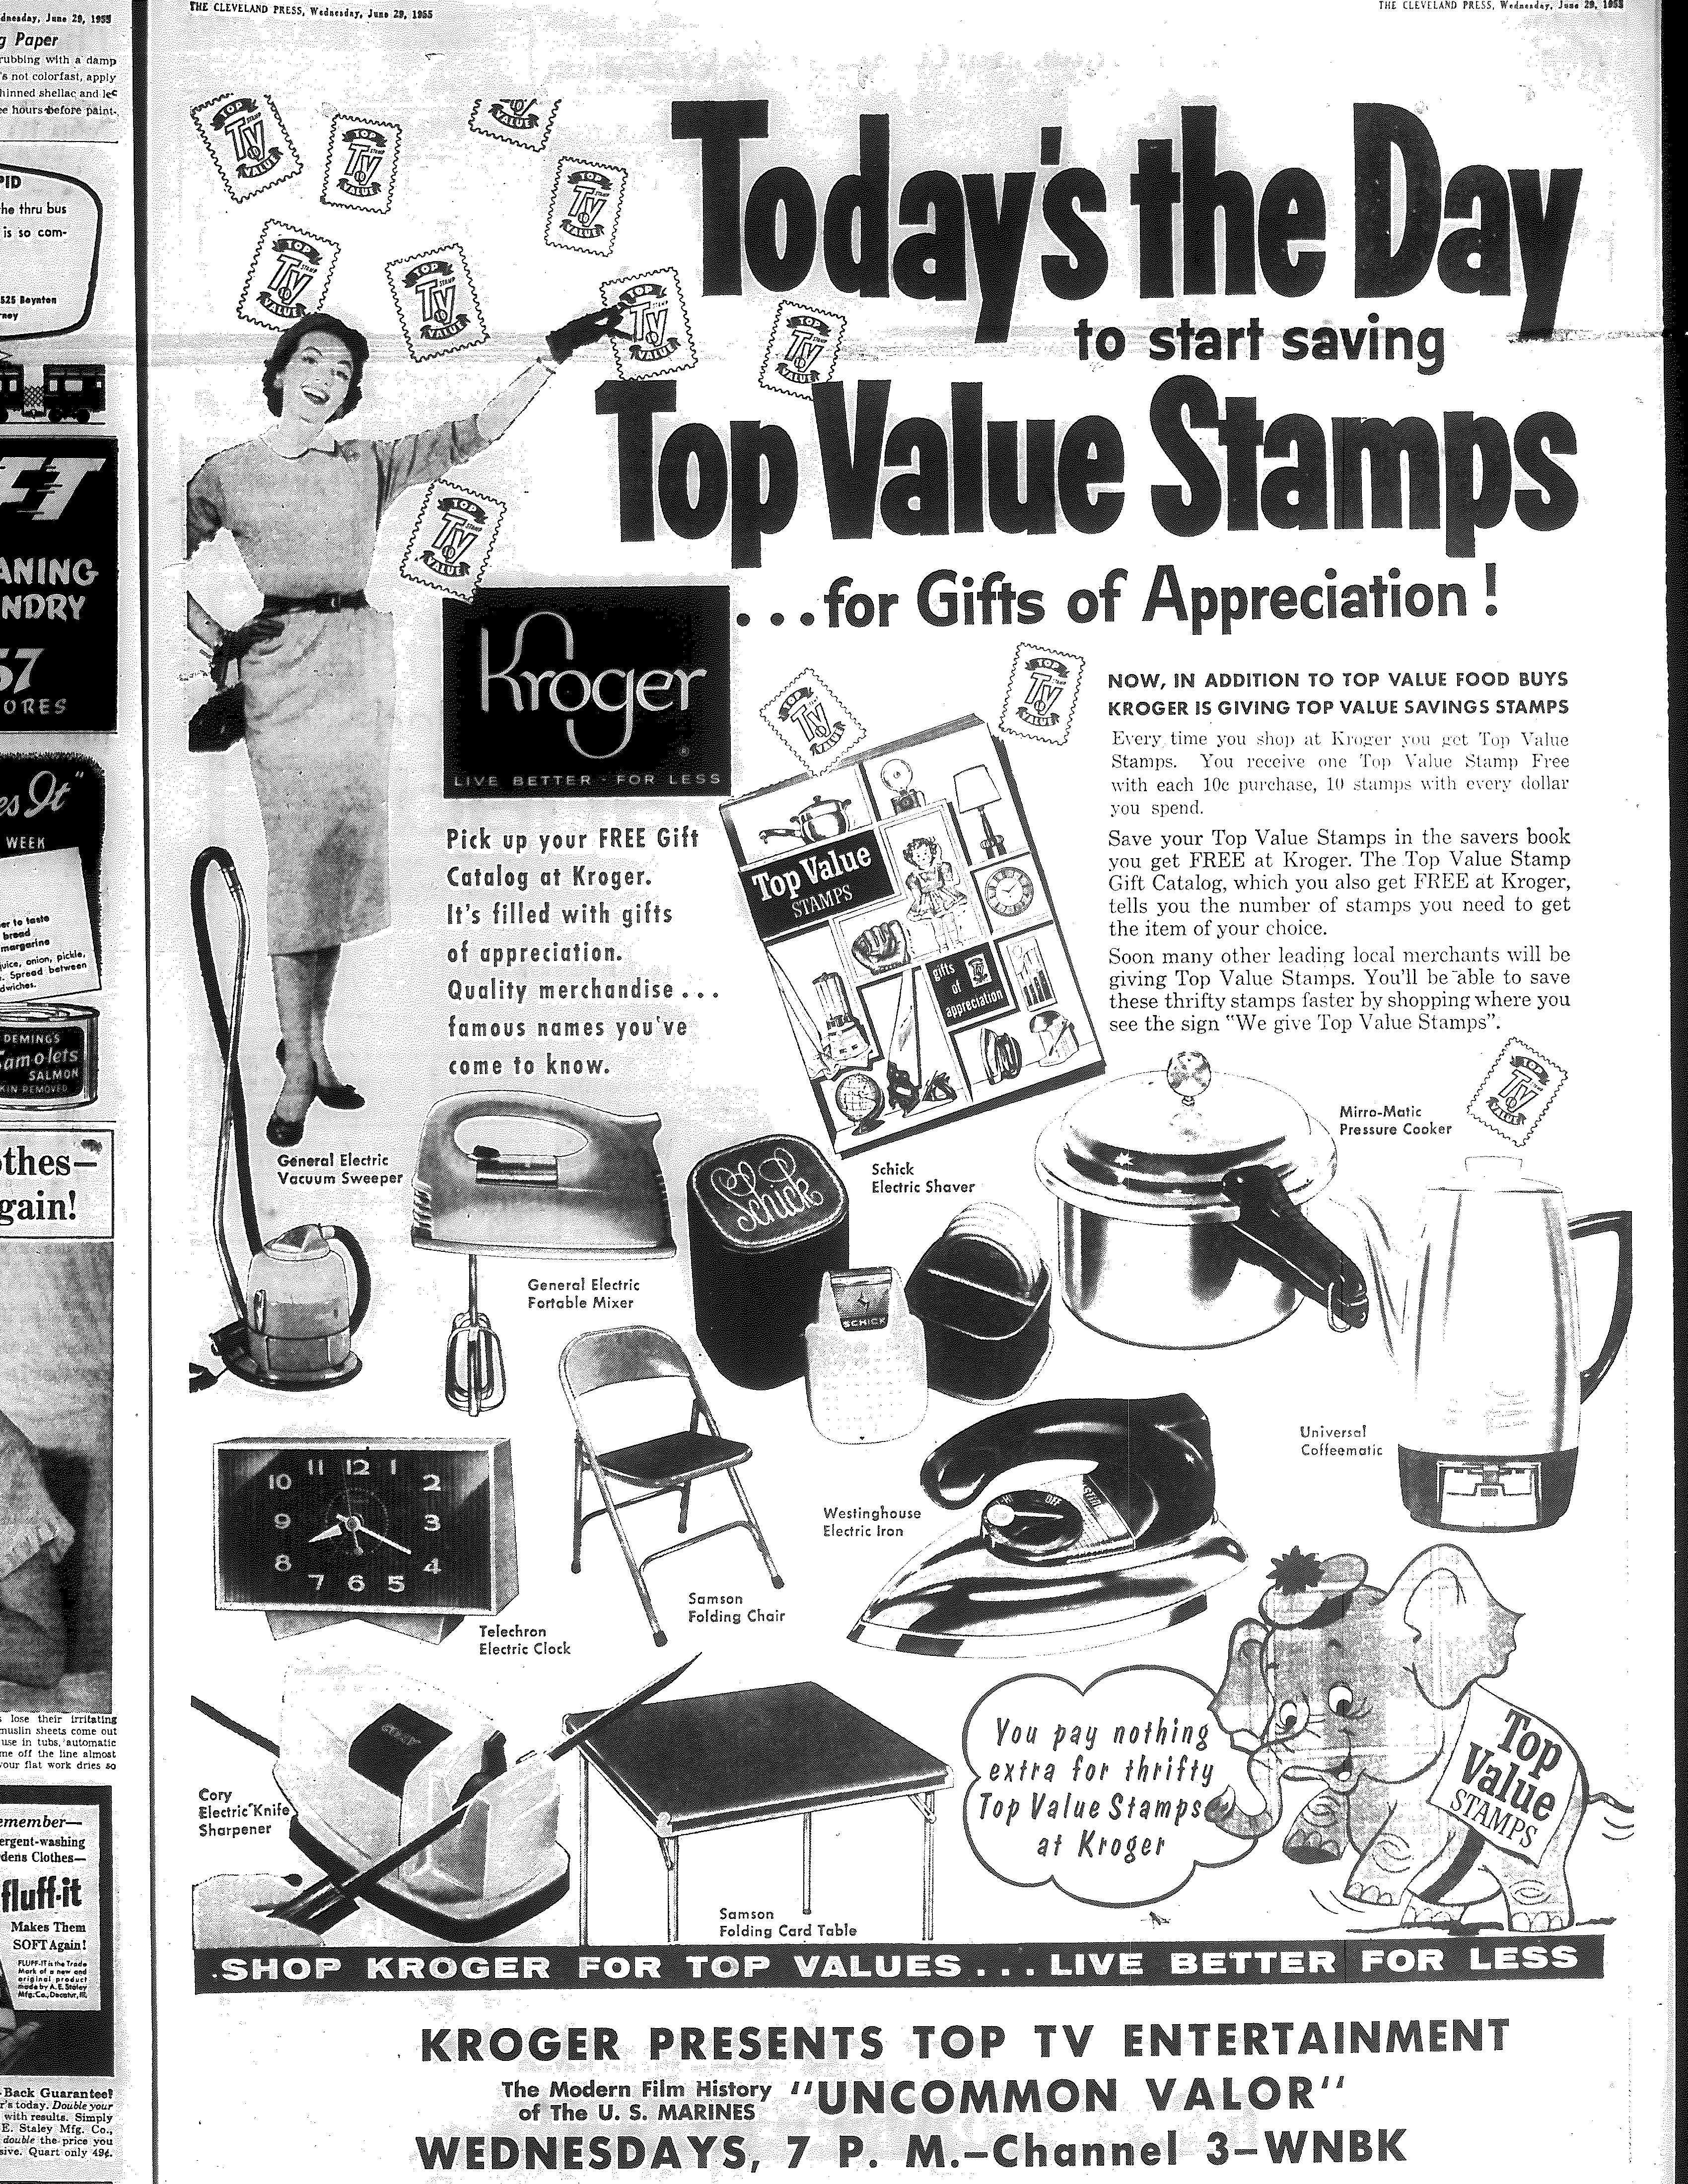 Kroger Top Value Stamps ad 6/29/1955 | Vintage Ohio Grocery Ads ...